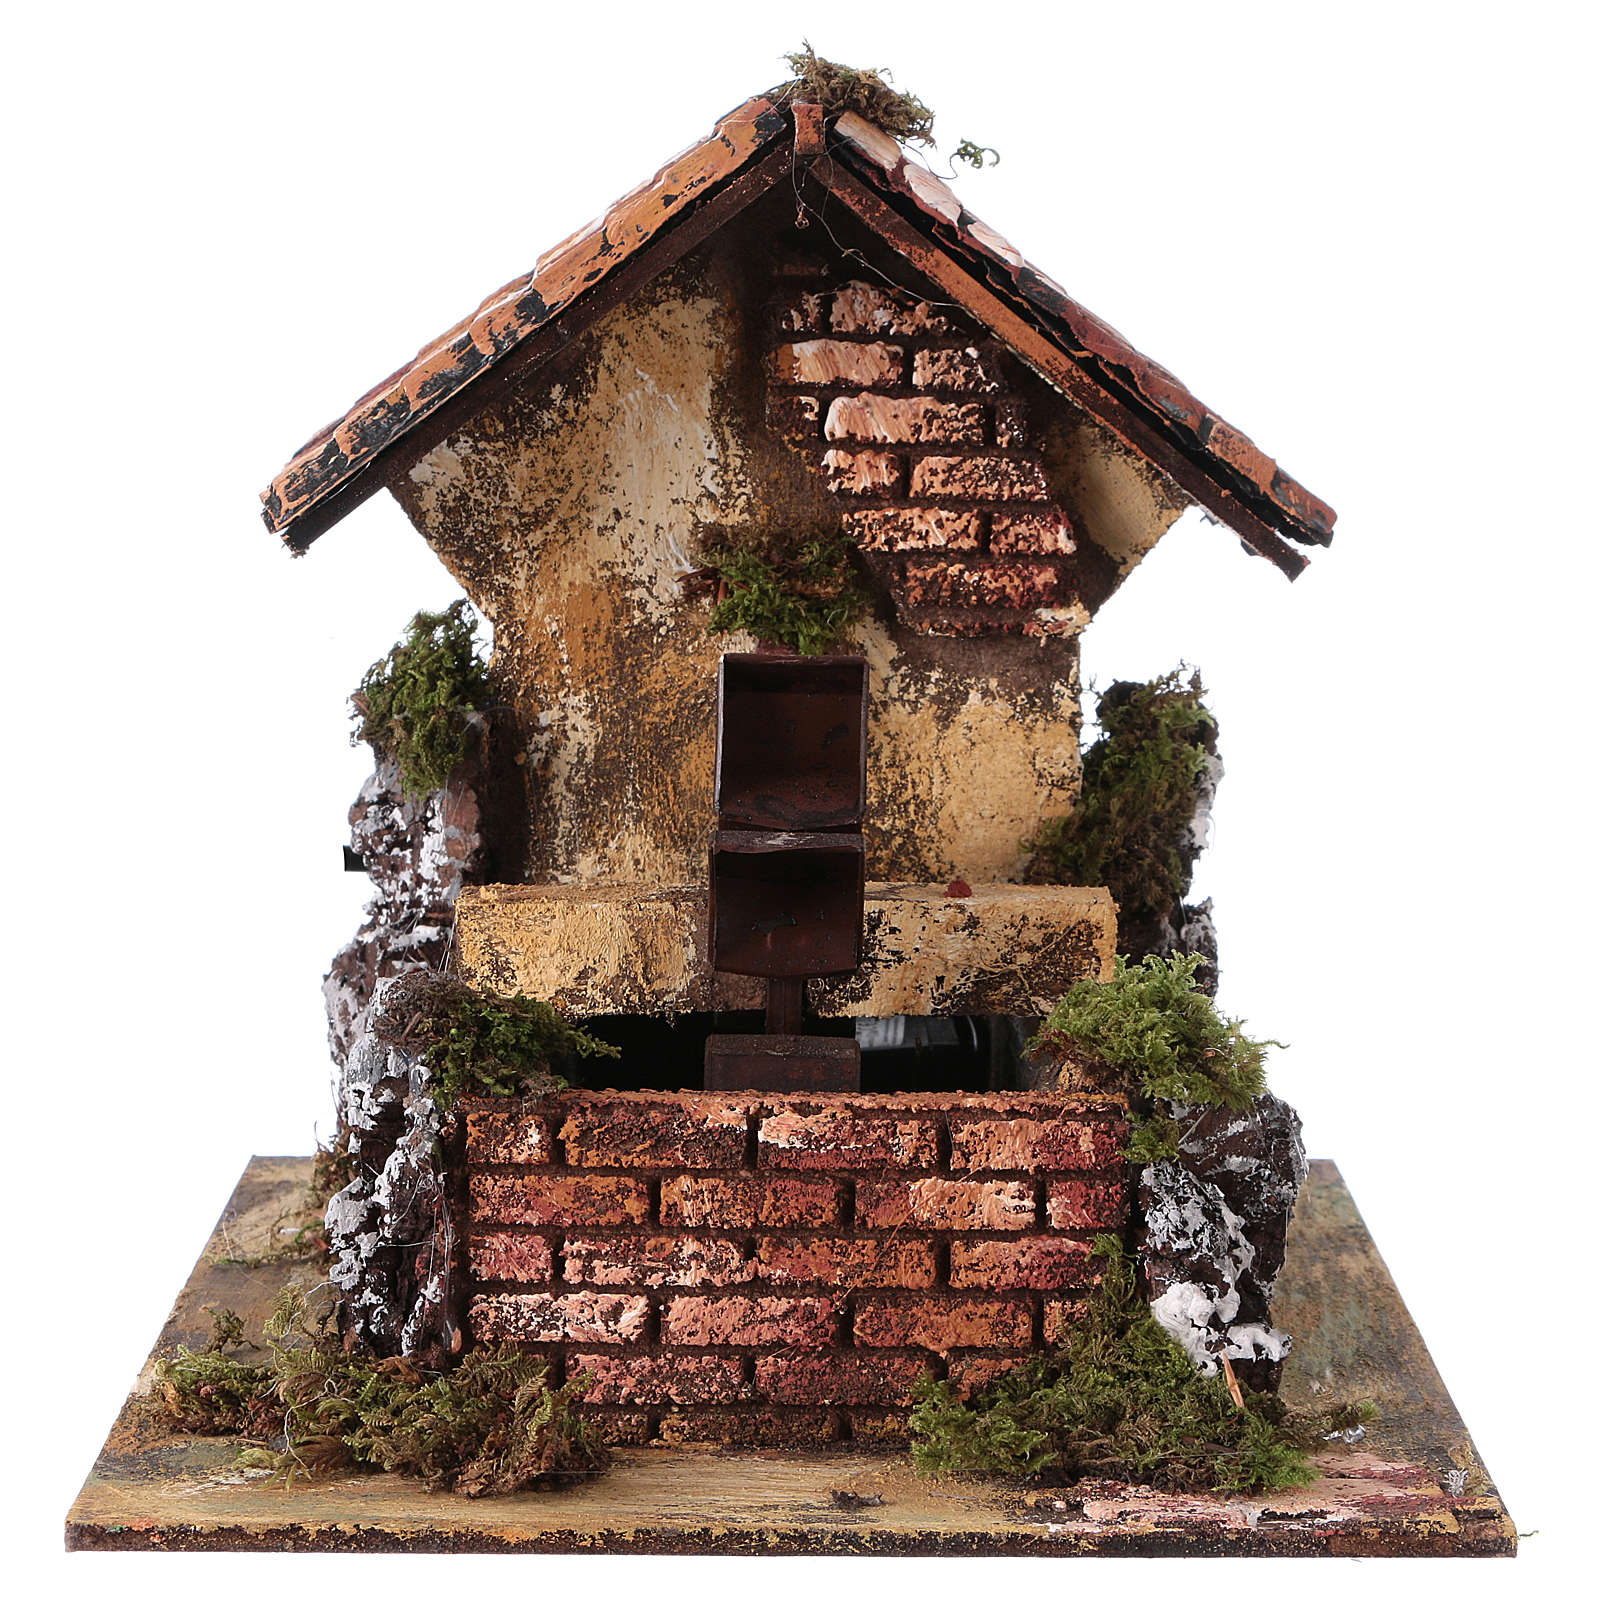 Watermill 20x25x25 cm for Nativity Scene 4